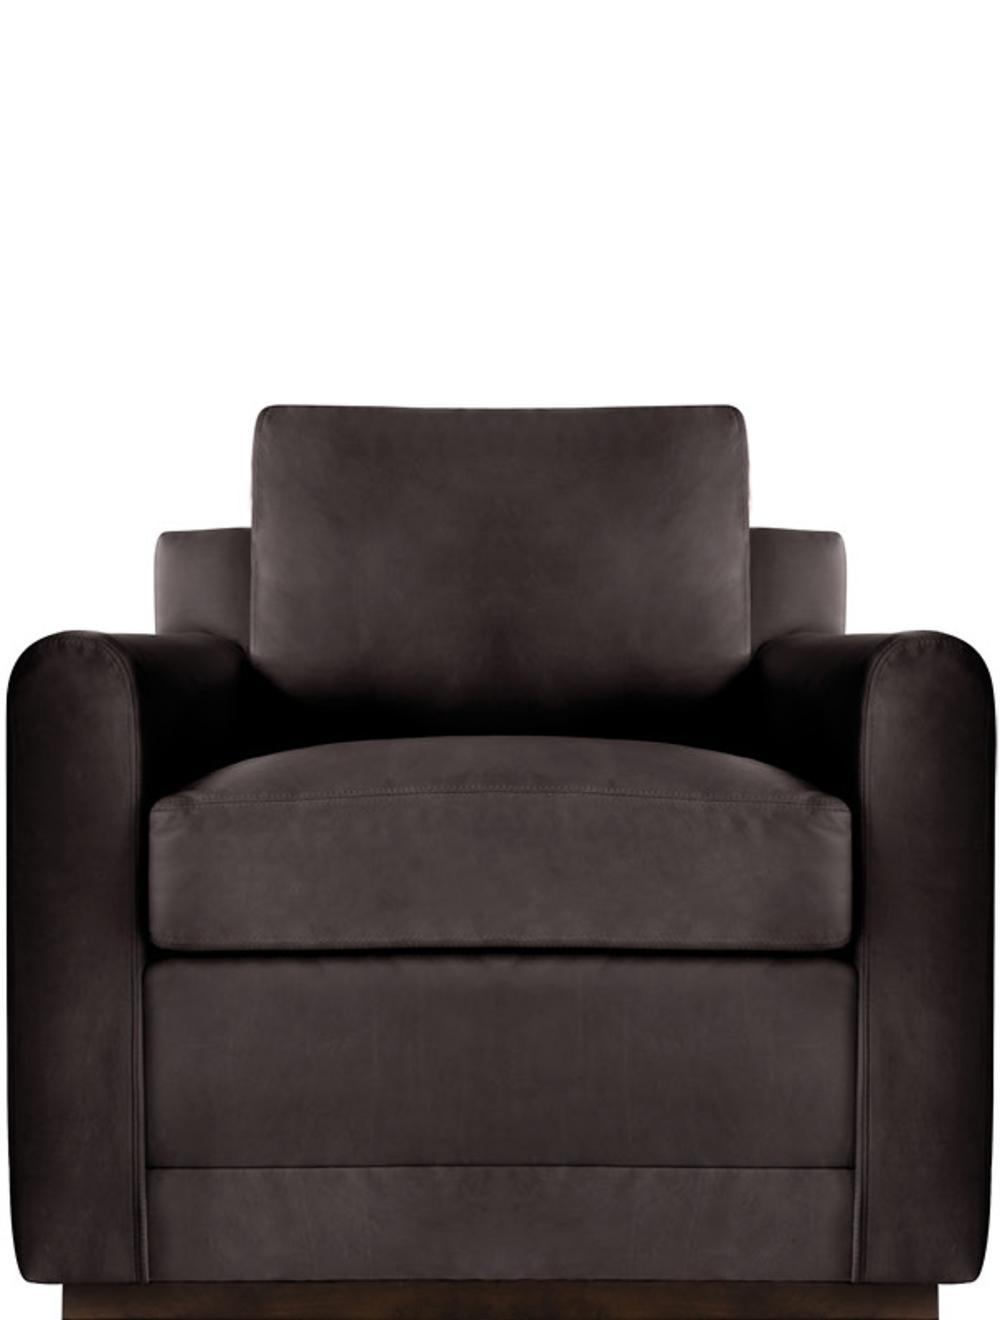 Van Peursem - Flatiron Chair